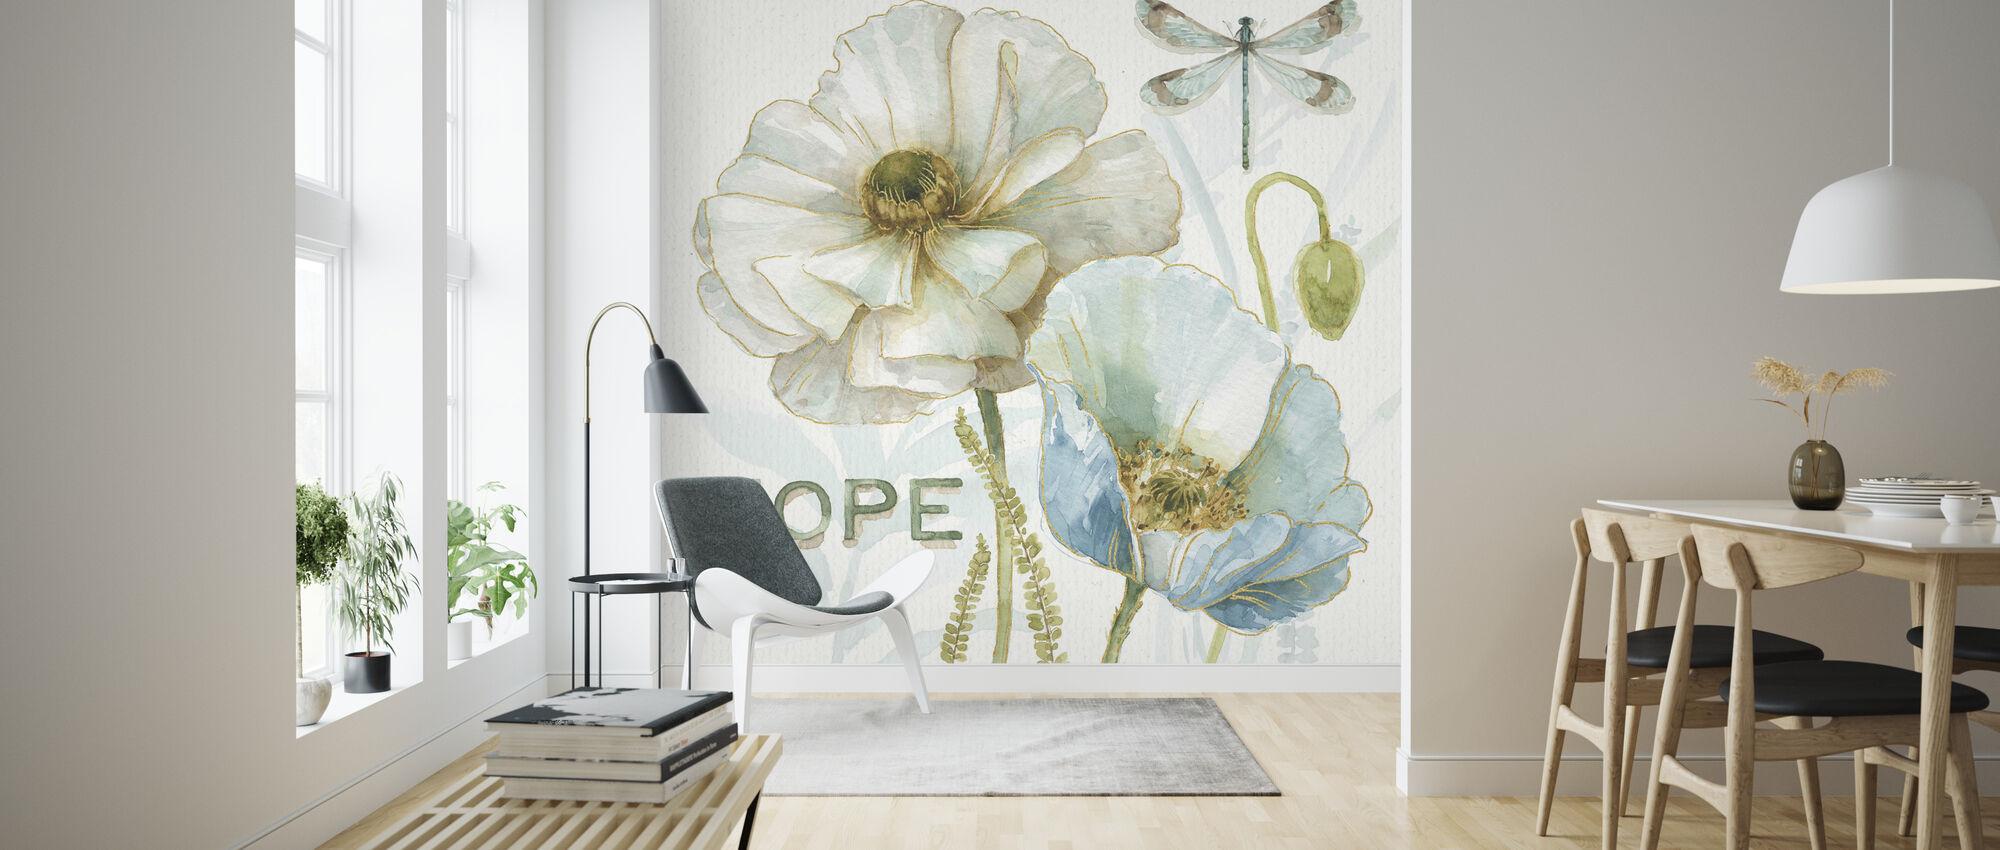 Mine drivhus Blomster - Håp - Tapet - Stue